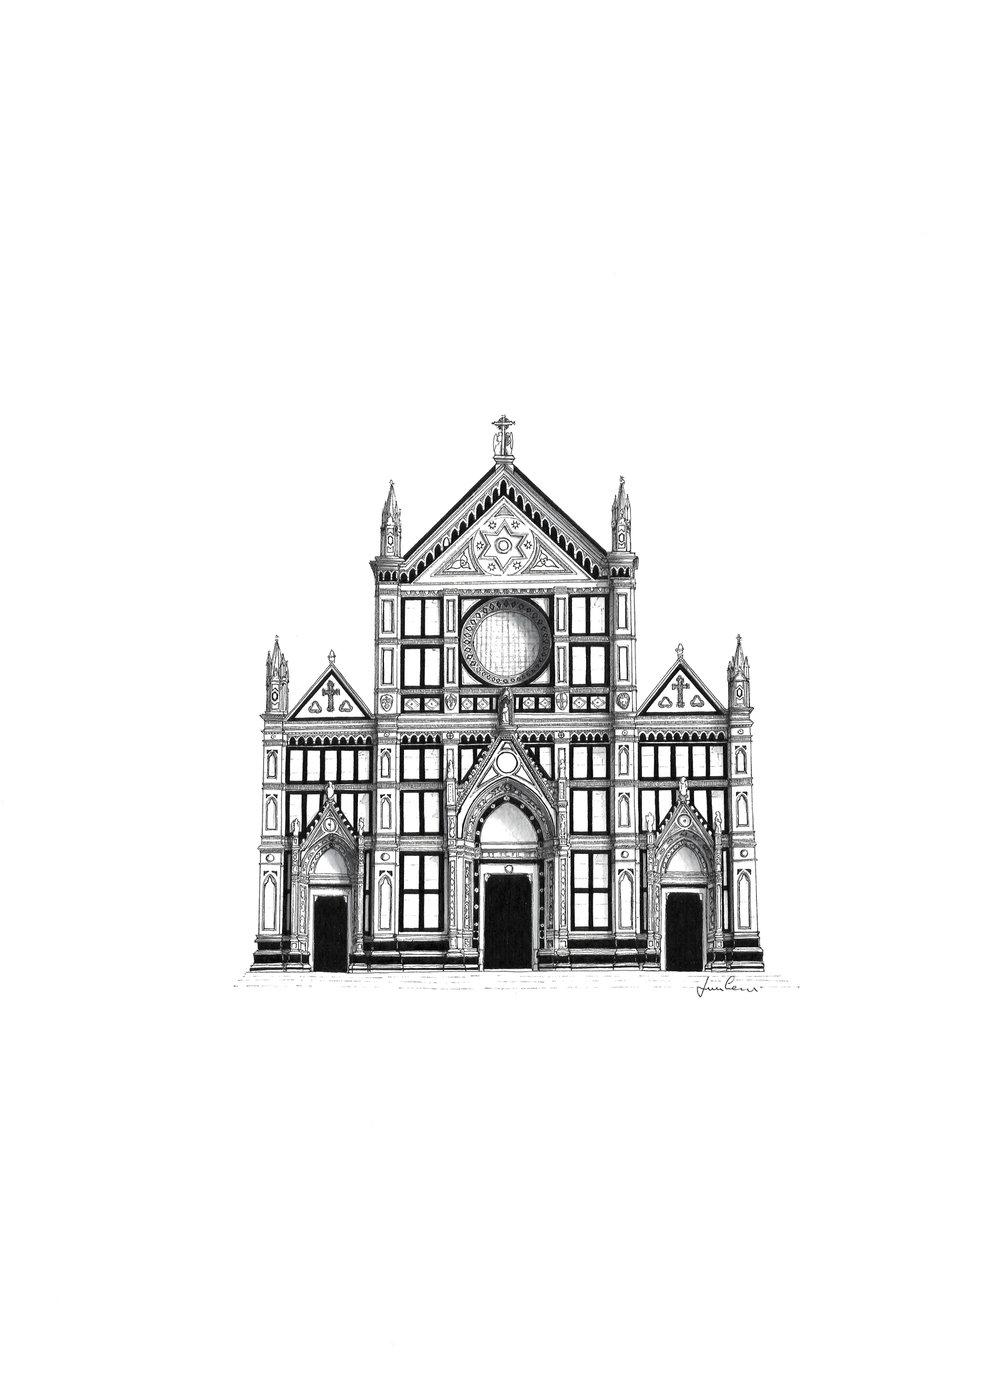 Basilica di Santa croce - 01